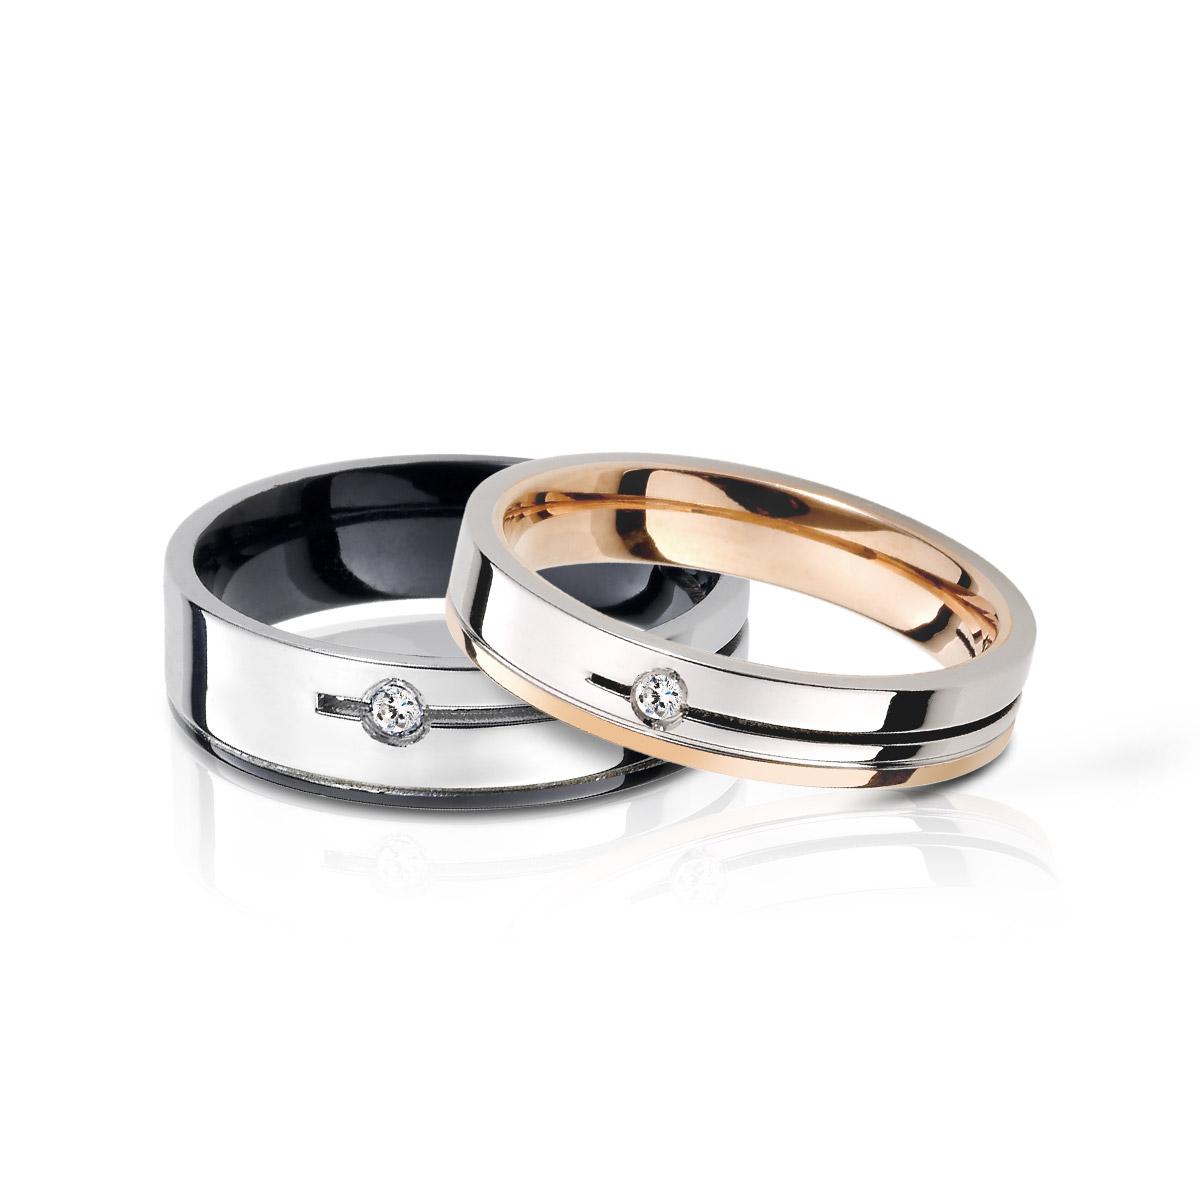 KIH239 經典耀眼情侶戒指